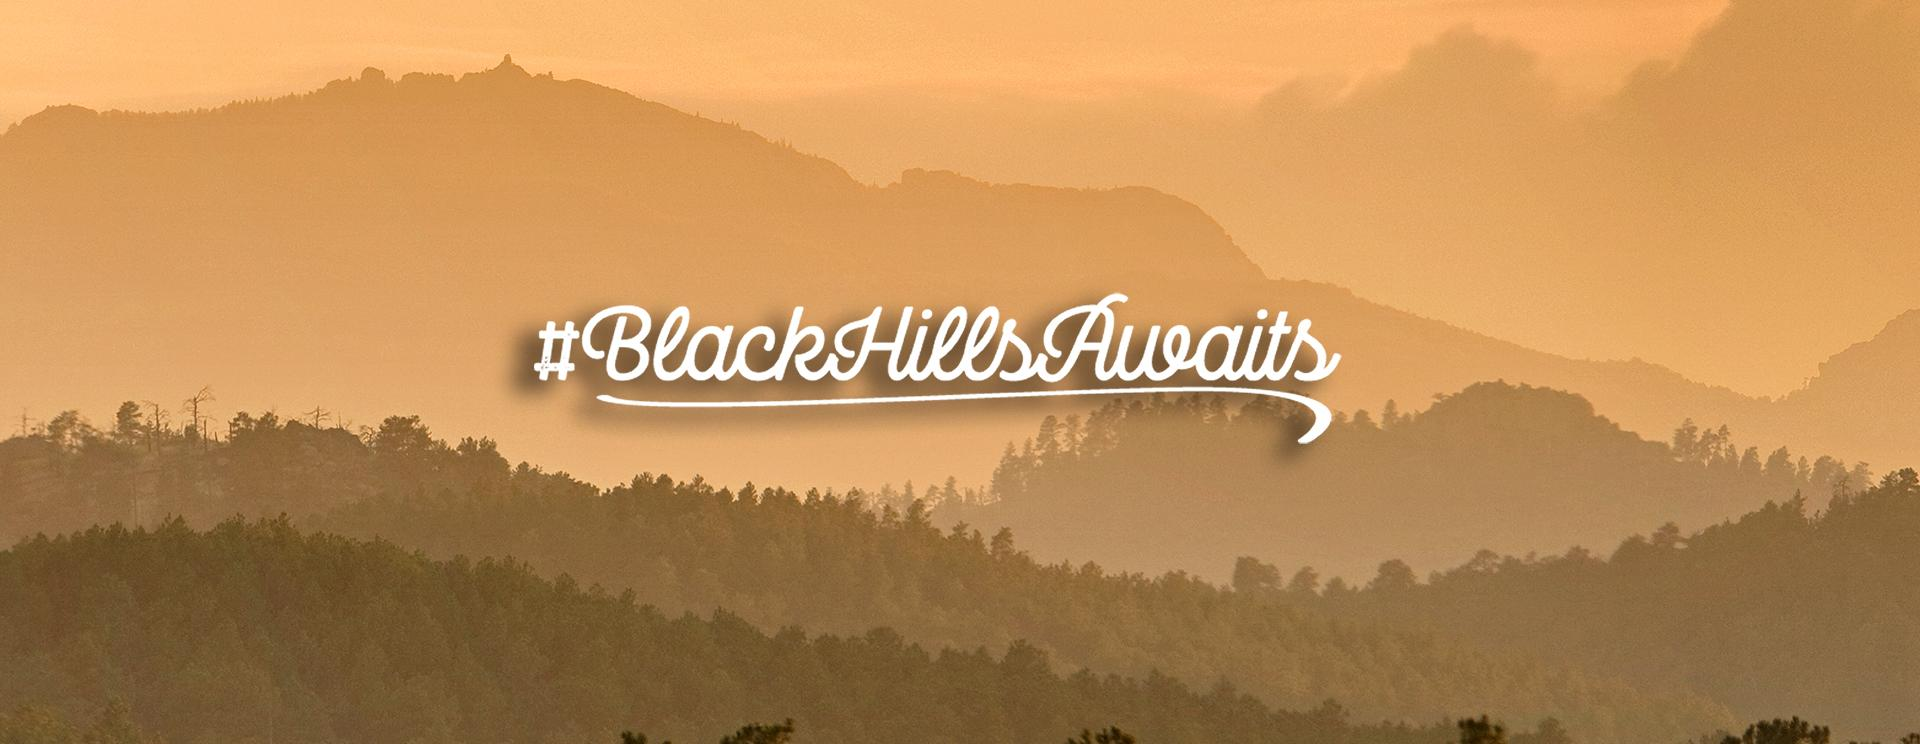 Relax With 5 Breathtaking Black Hills and Badlands Photos | #BlackHillsAwaits